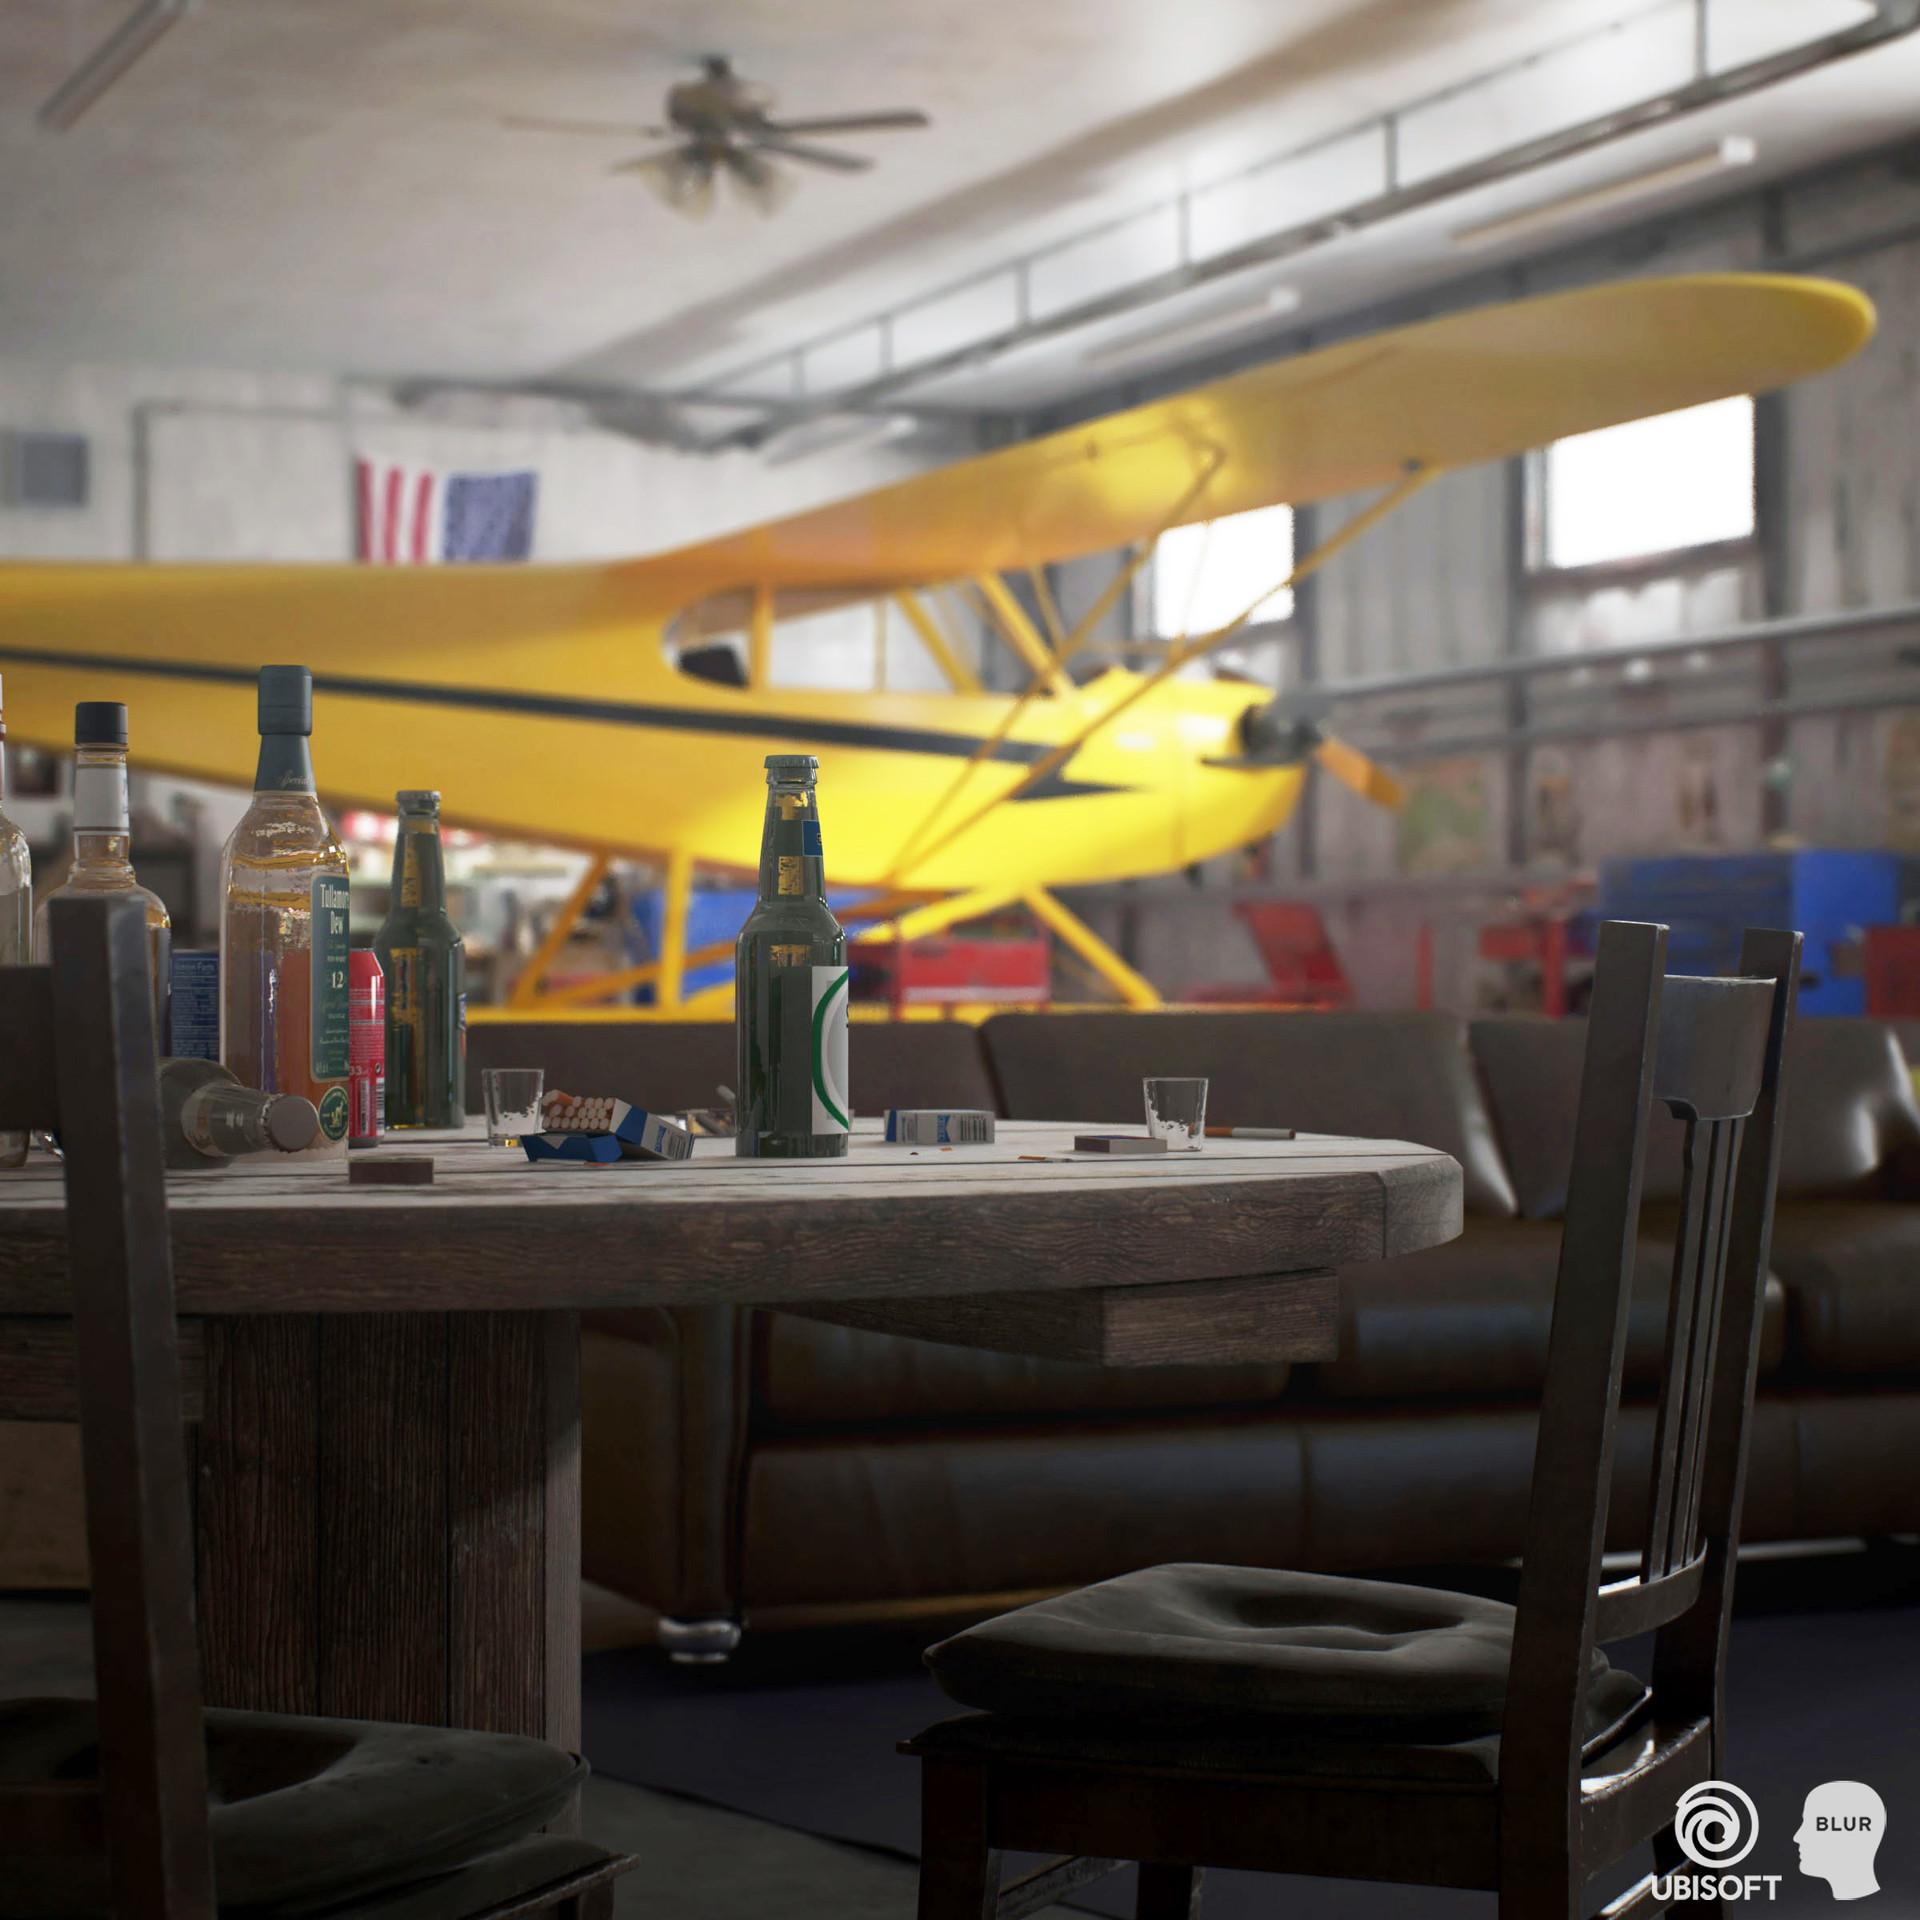 Andrew averkin zeta hangar 12